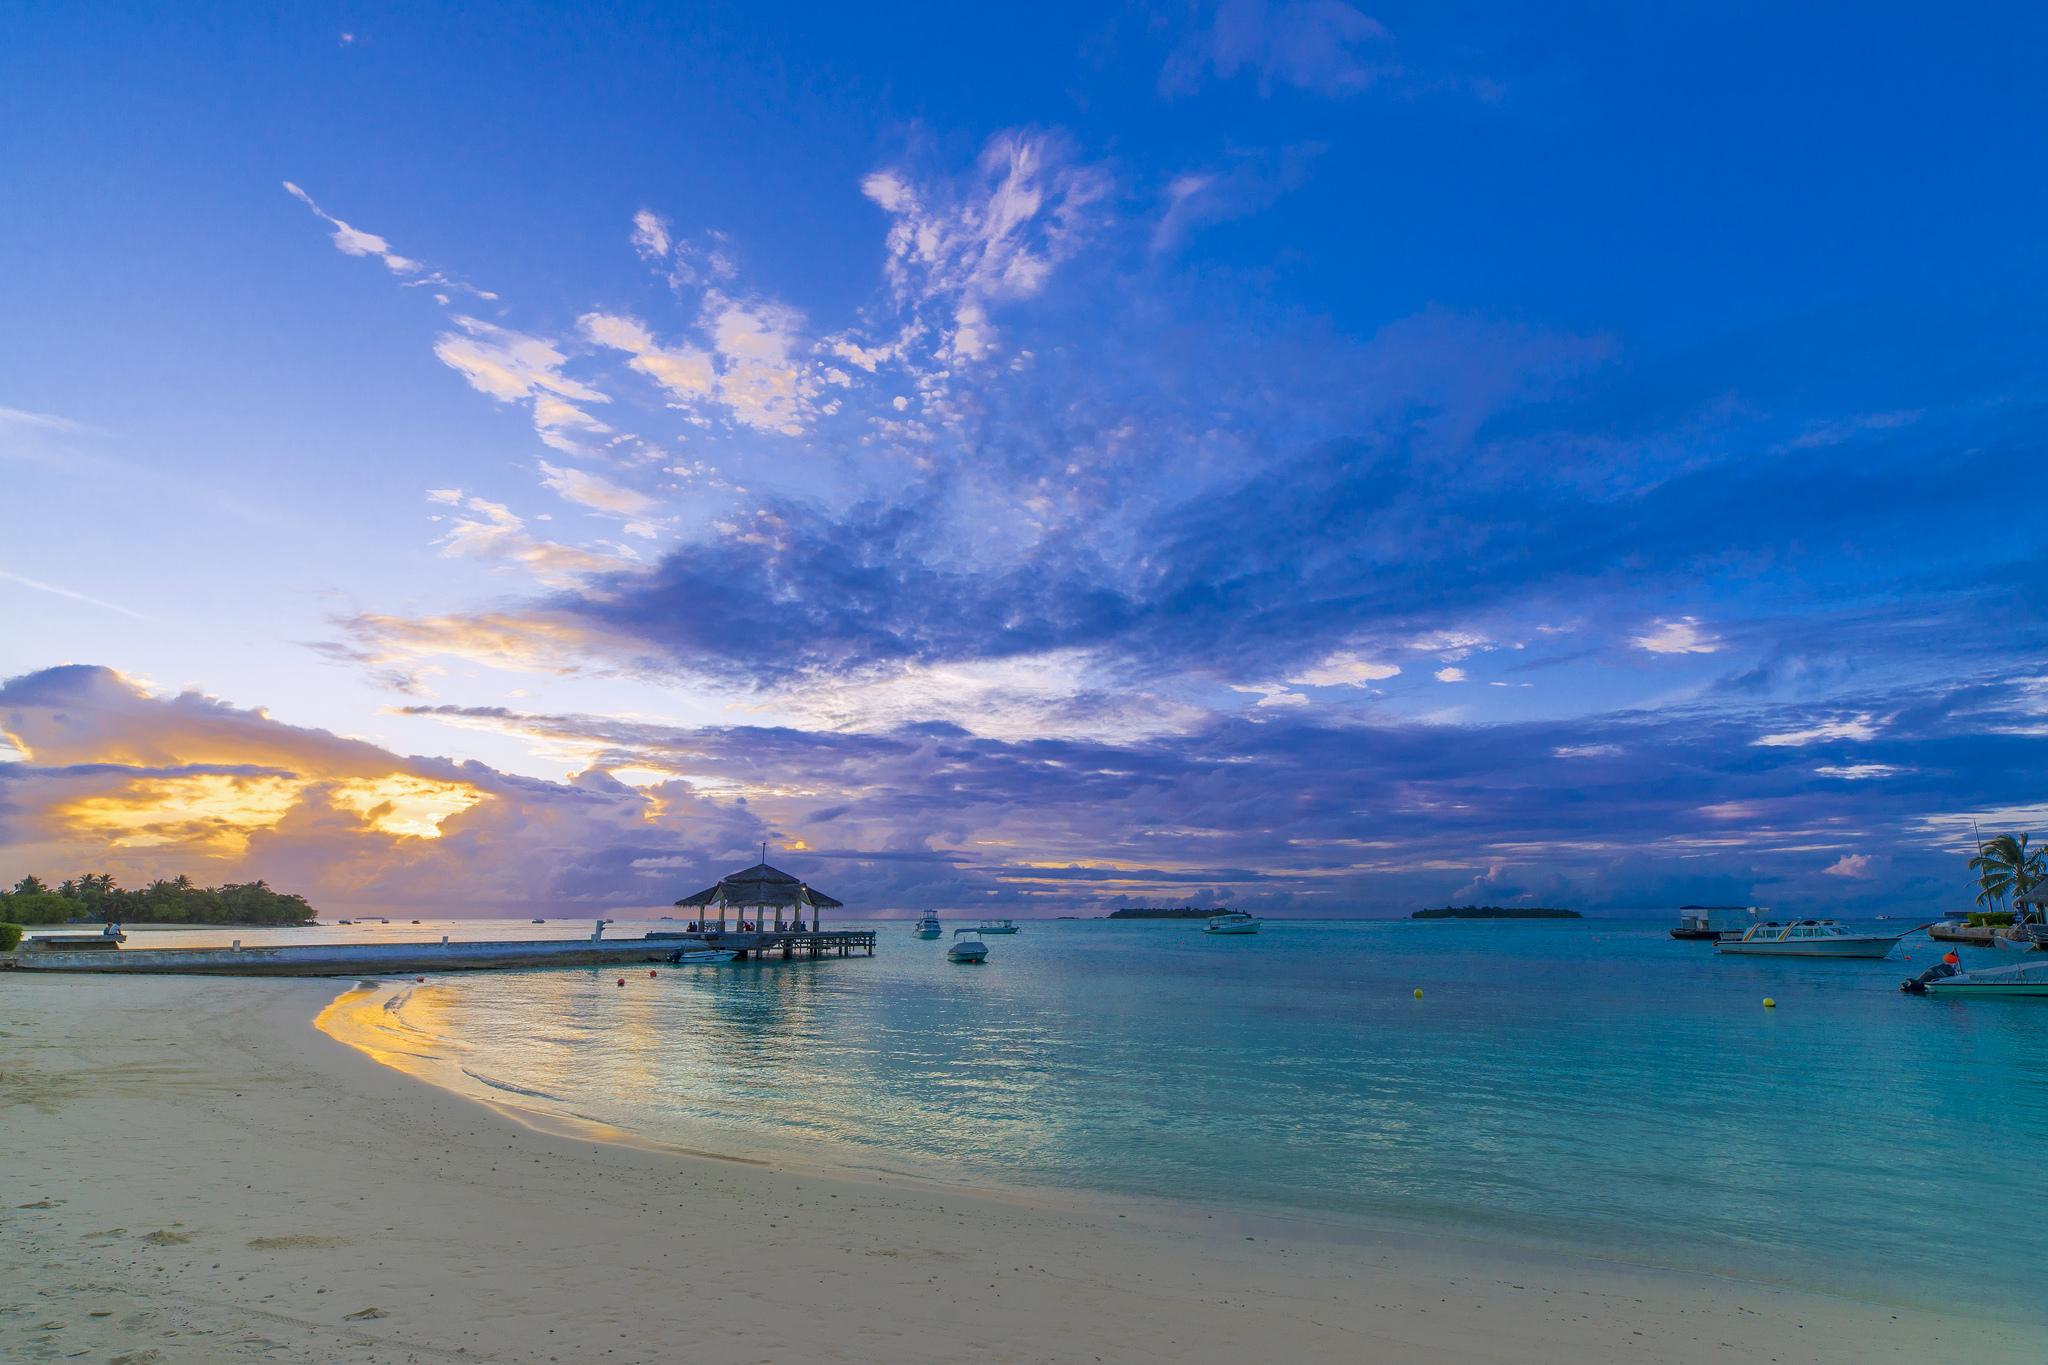 Hermosa playa al atardecer - 2048x1365